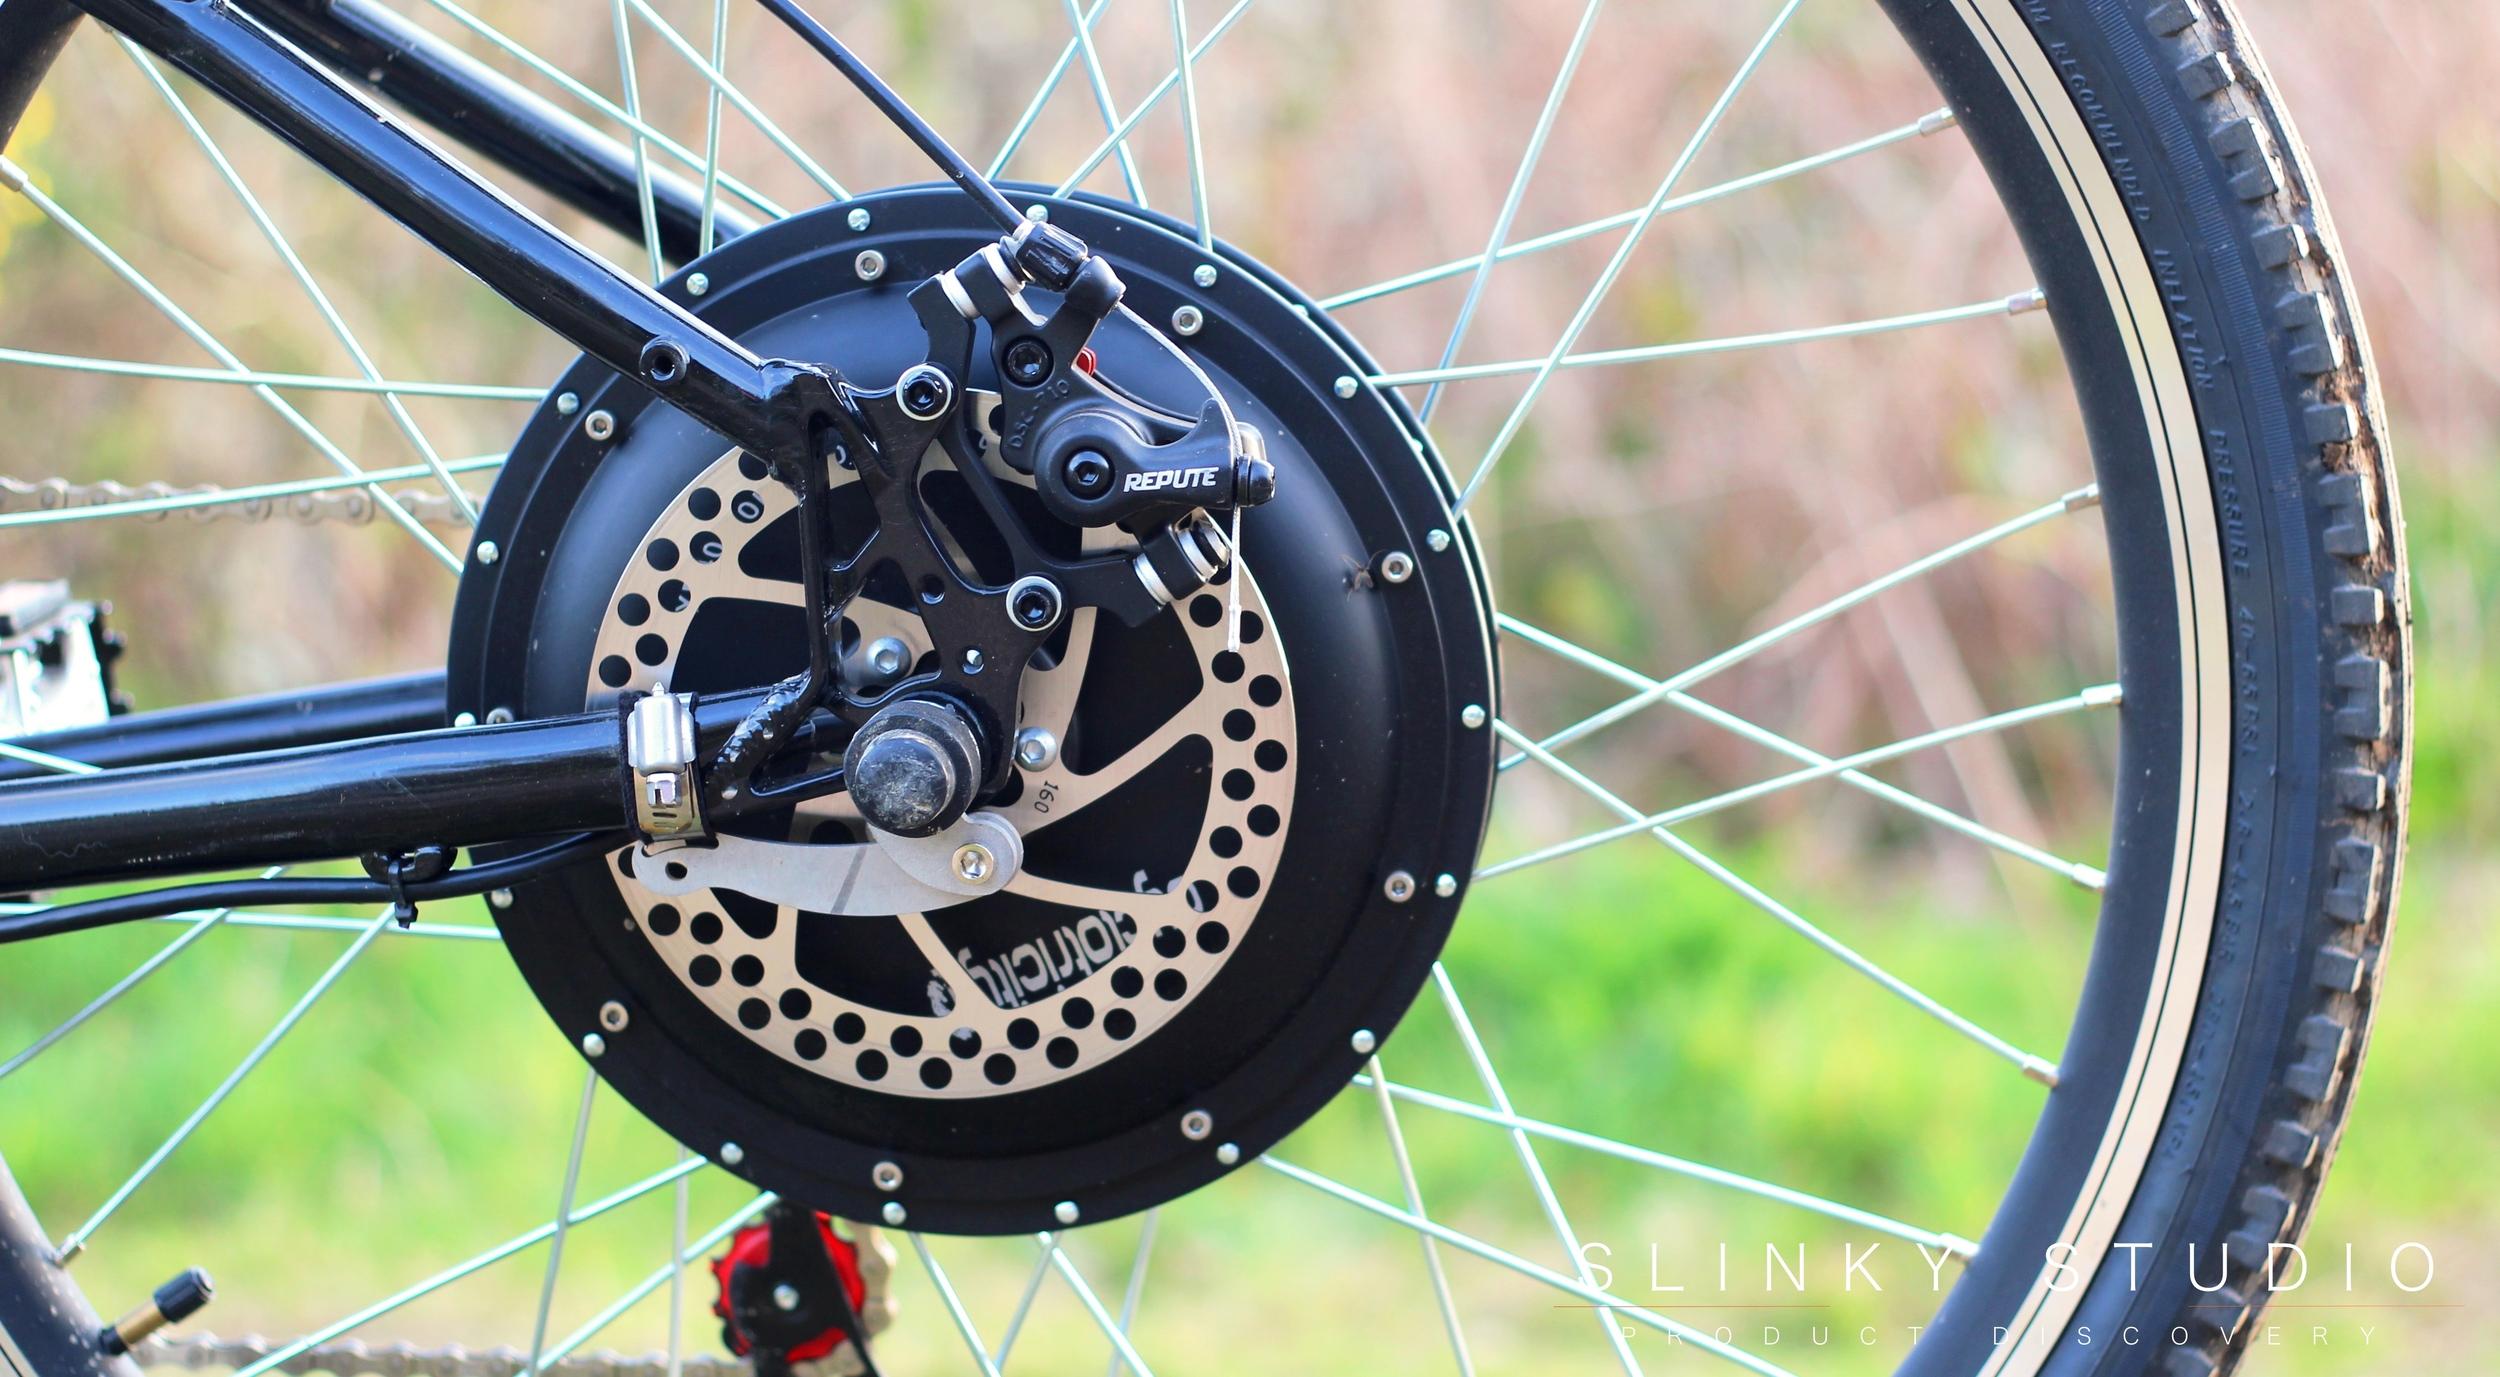 Cyclotricity Stealth eBike Motor in Rear Wheel.jpg